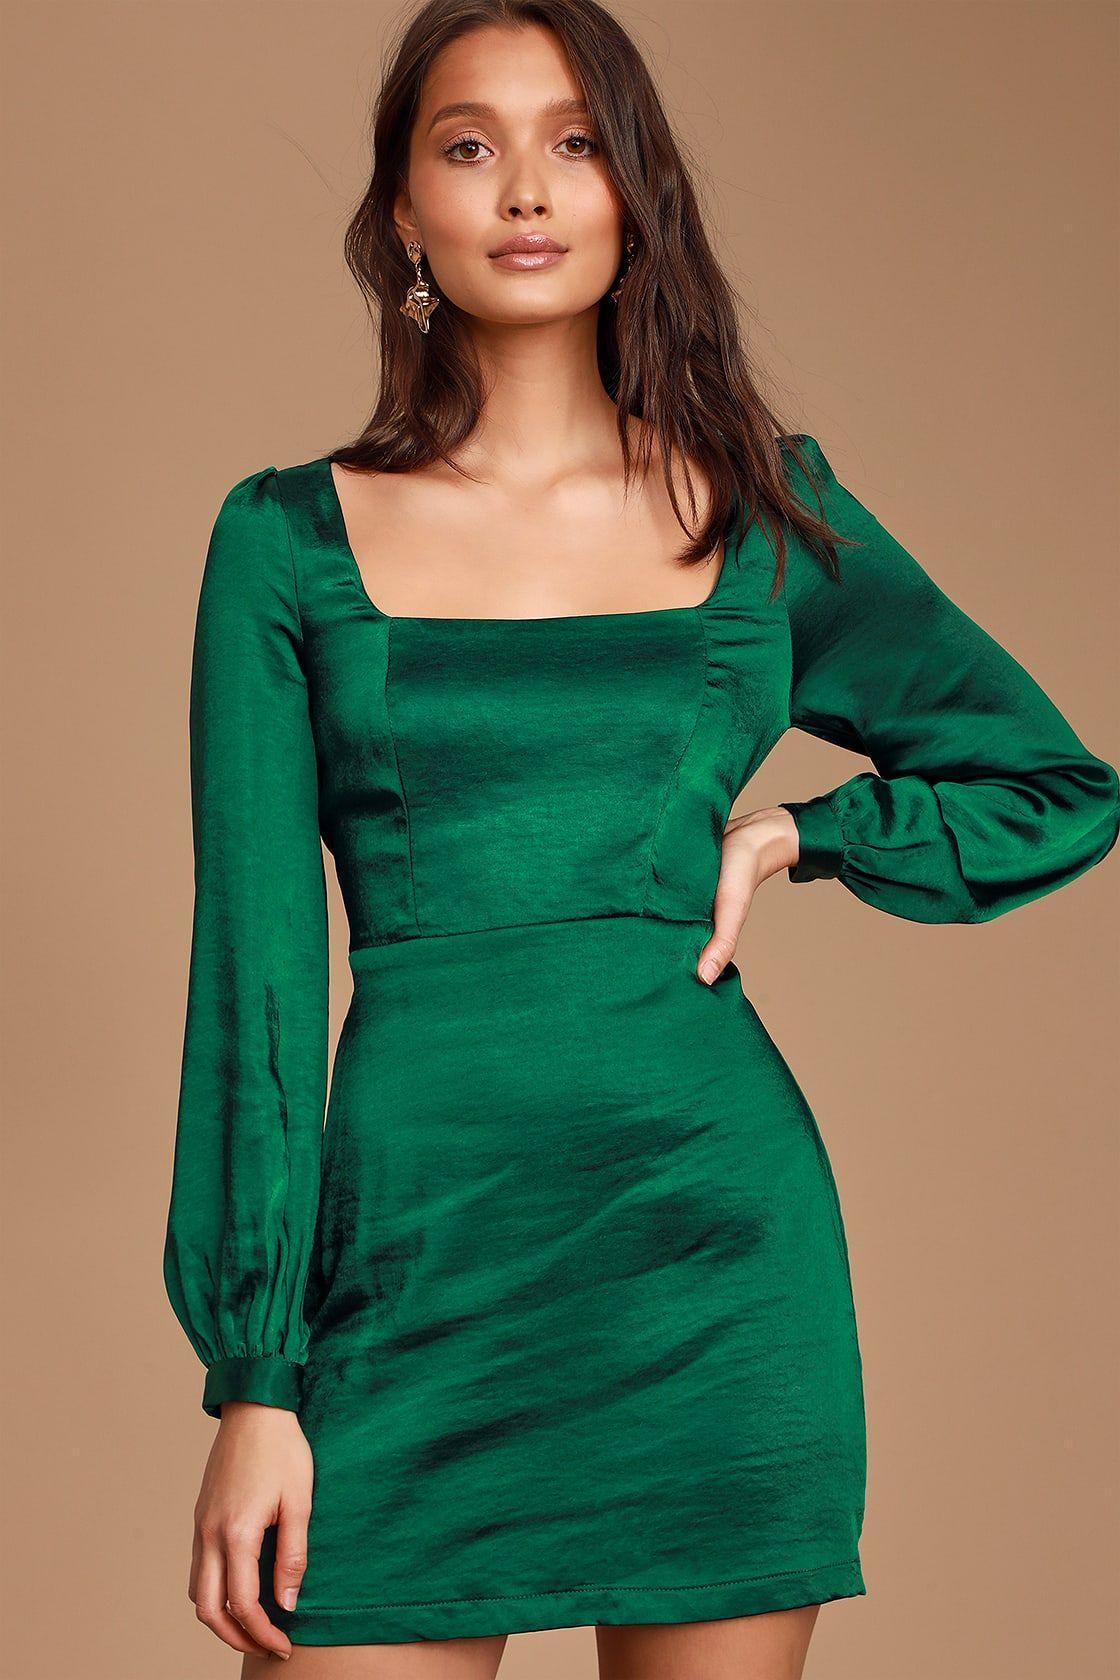 Got The Love Emerald Green Satin Square Neck Mini Dress Satin Dress Long Green Satin Dress Mini Dress [ 1680 x 1120 Pixel ]